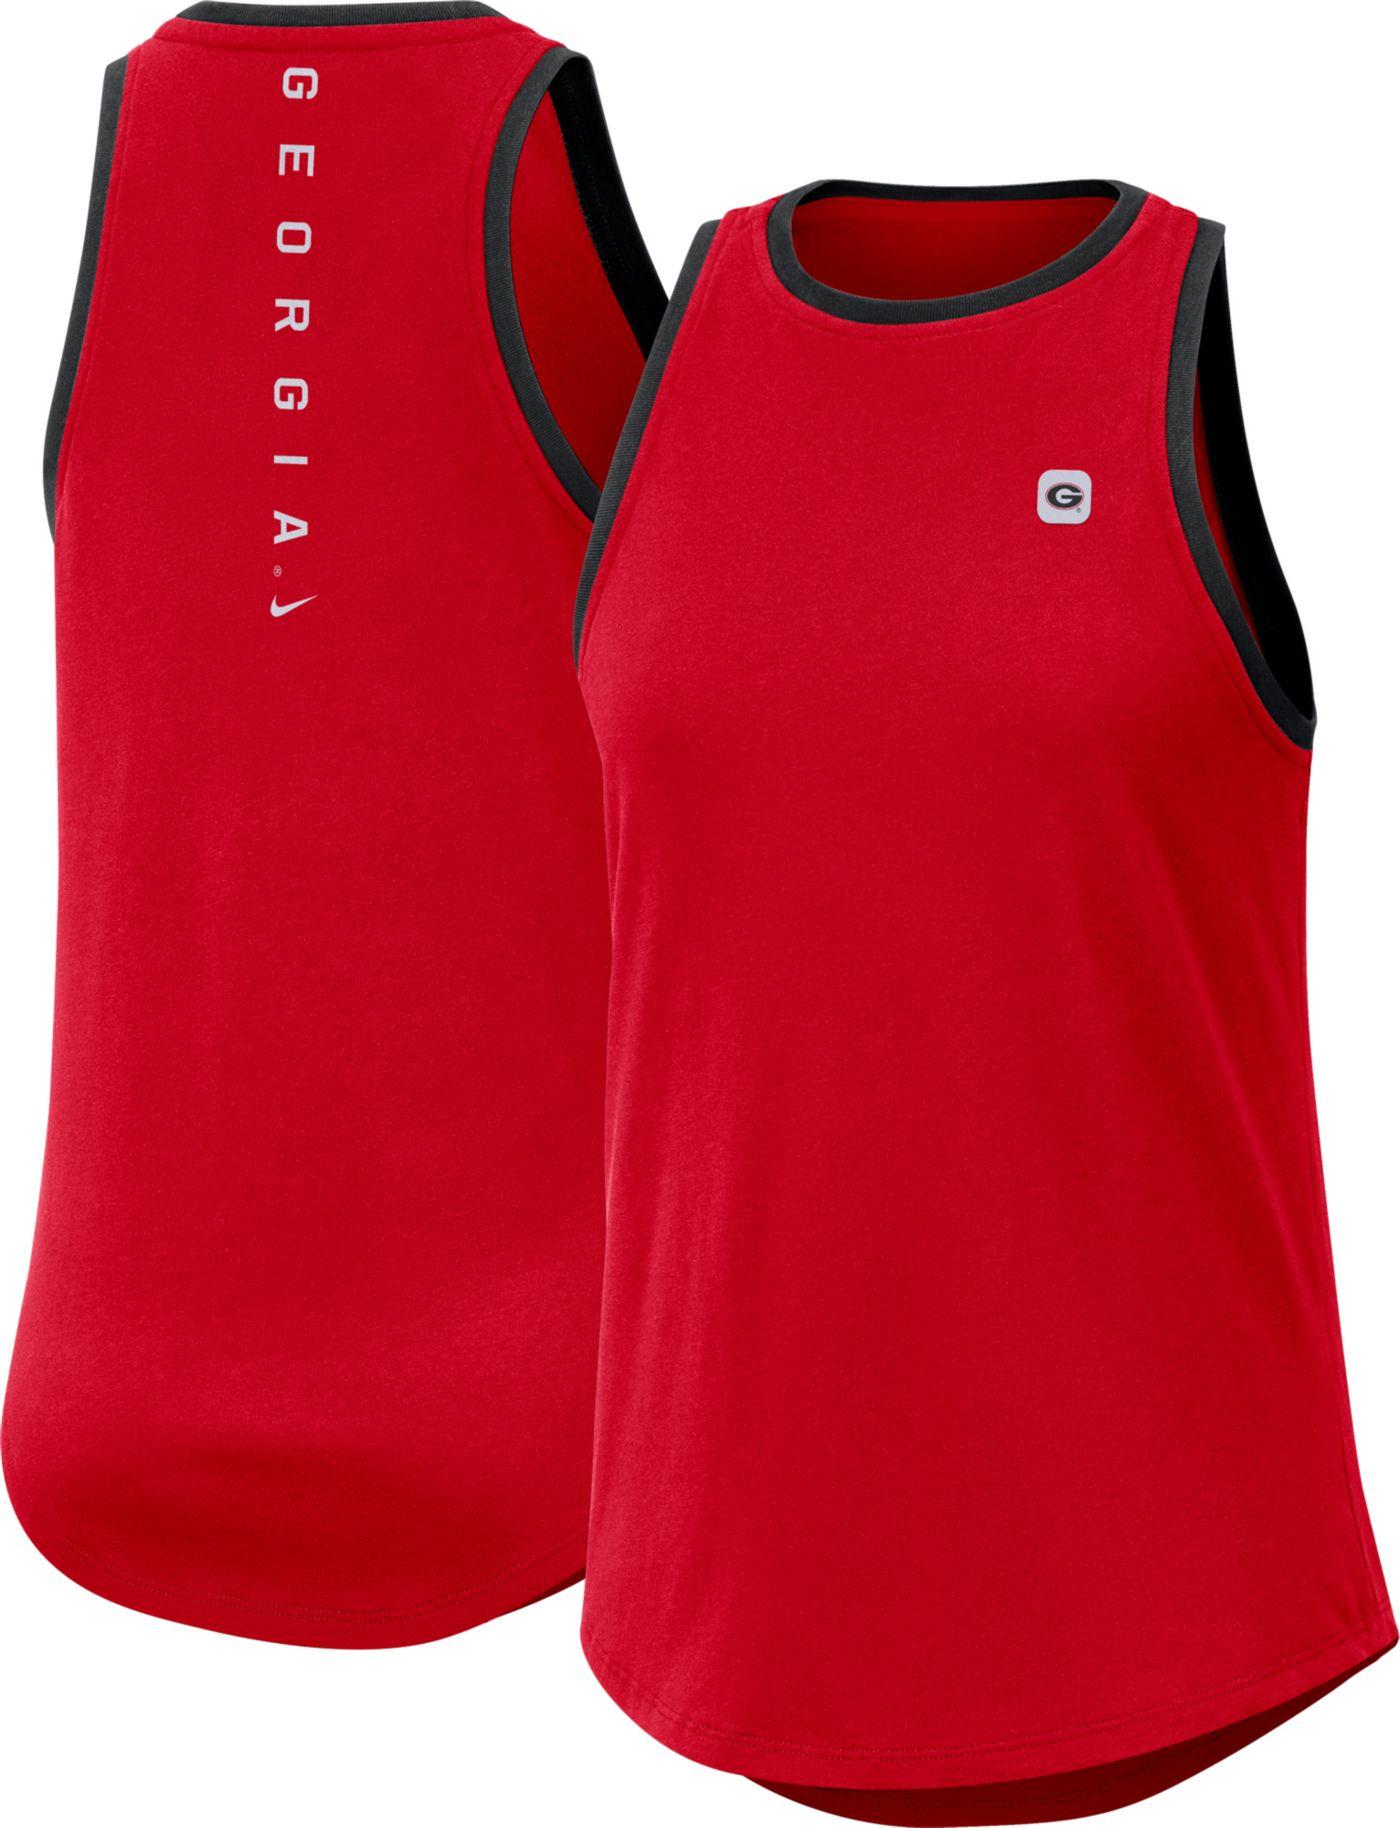 Nike Women's Georgia Bulldogs Red High Neck Dri-FIT Tank Top